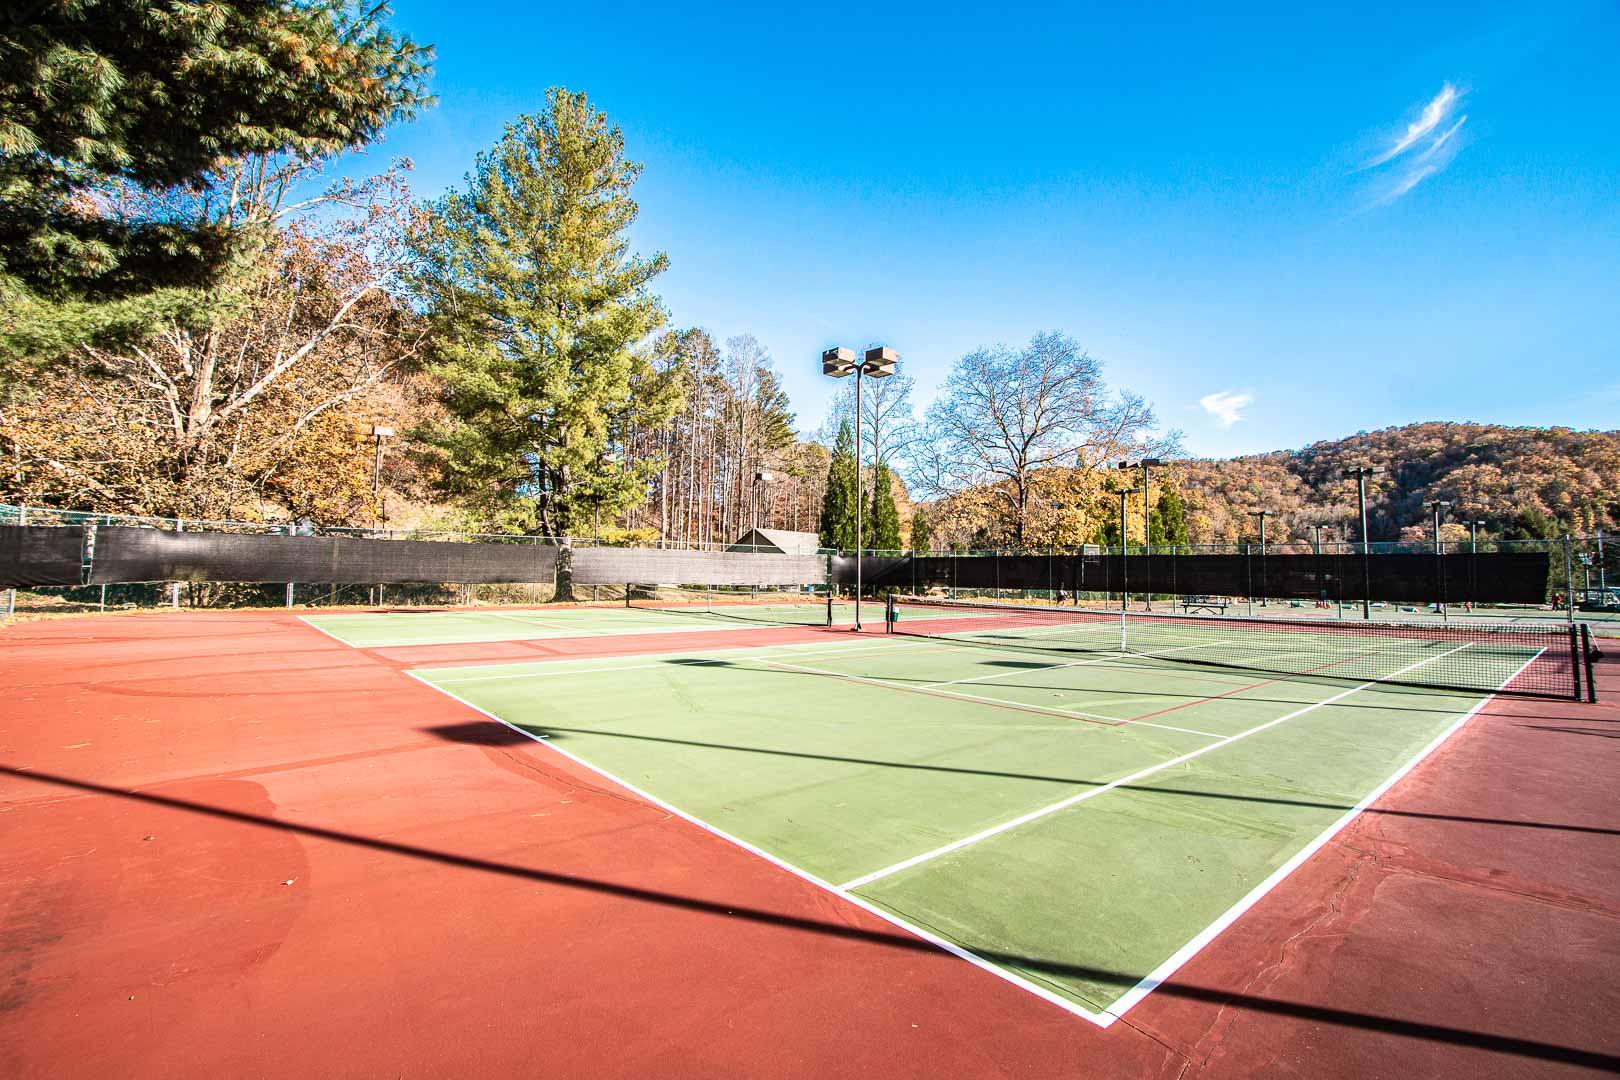 An outside tennis court at VRI's Mountain Loft Resort in North Carolina.